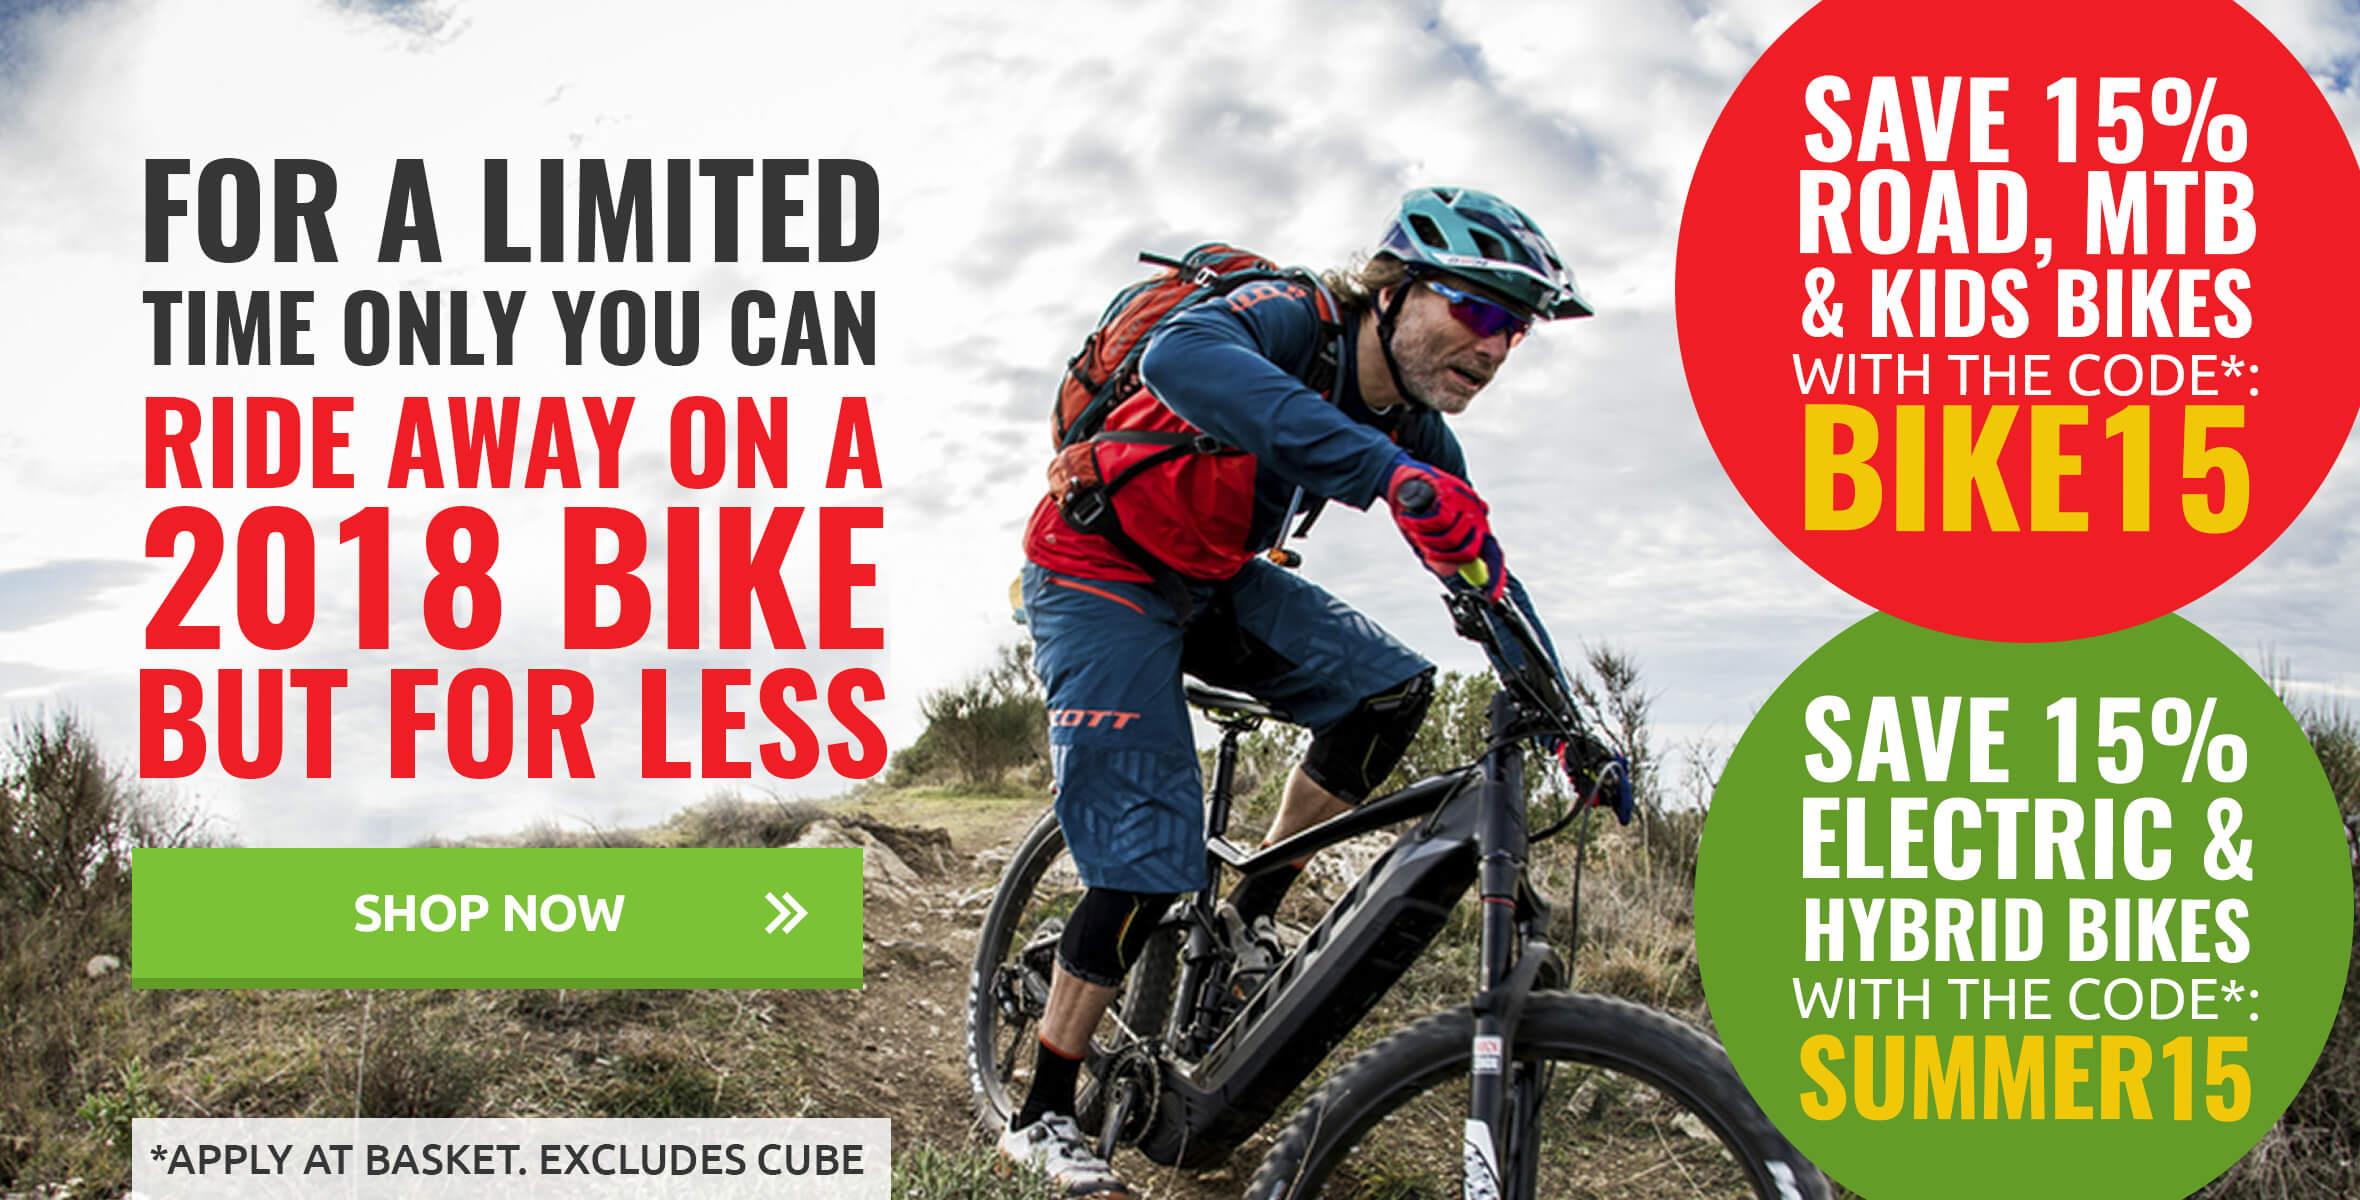 Save 15% on 2018 Bikes